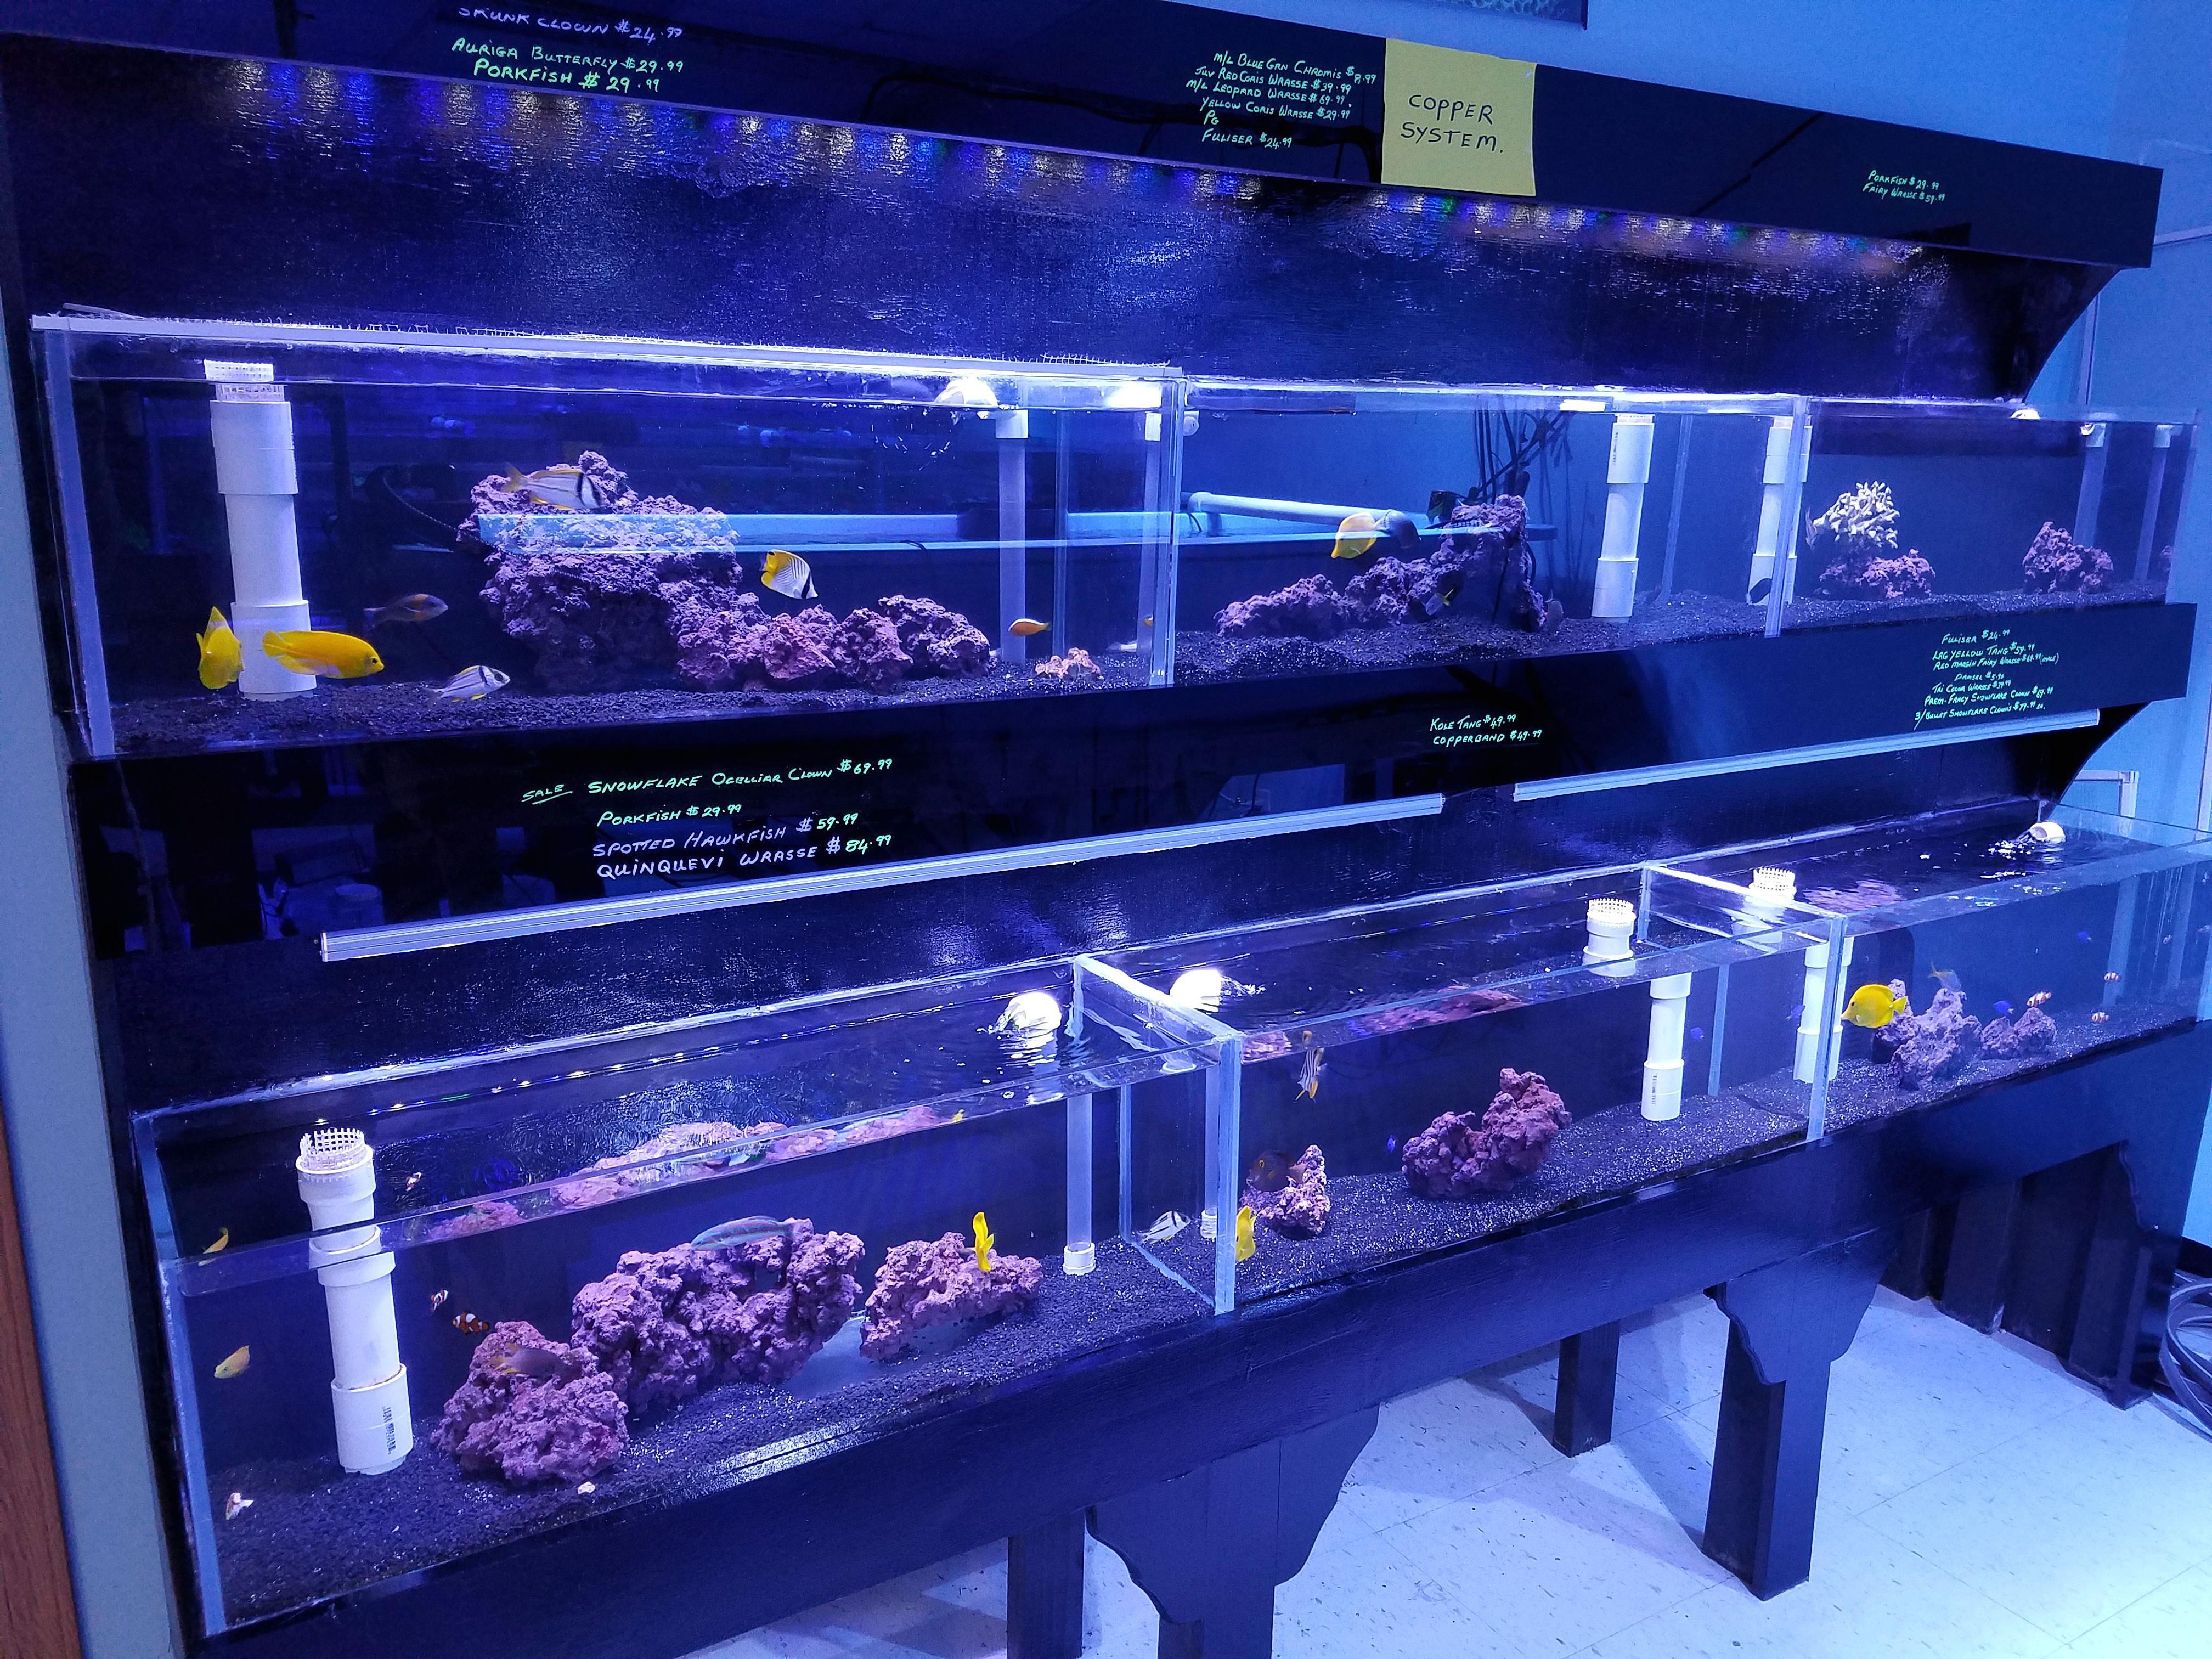 Freshwater fish store near me - 20160916_181043